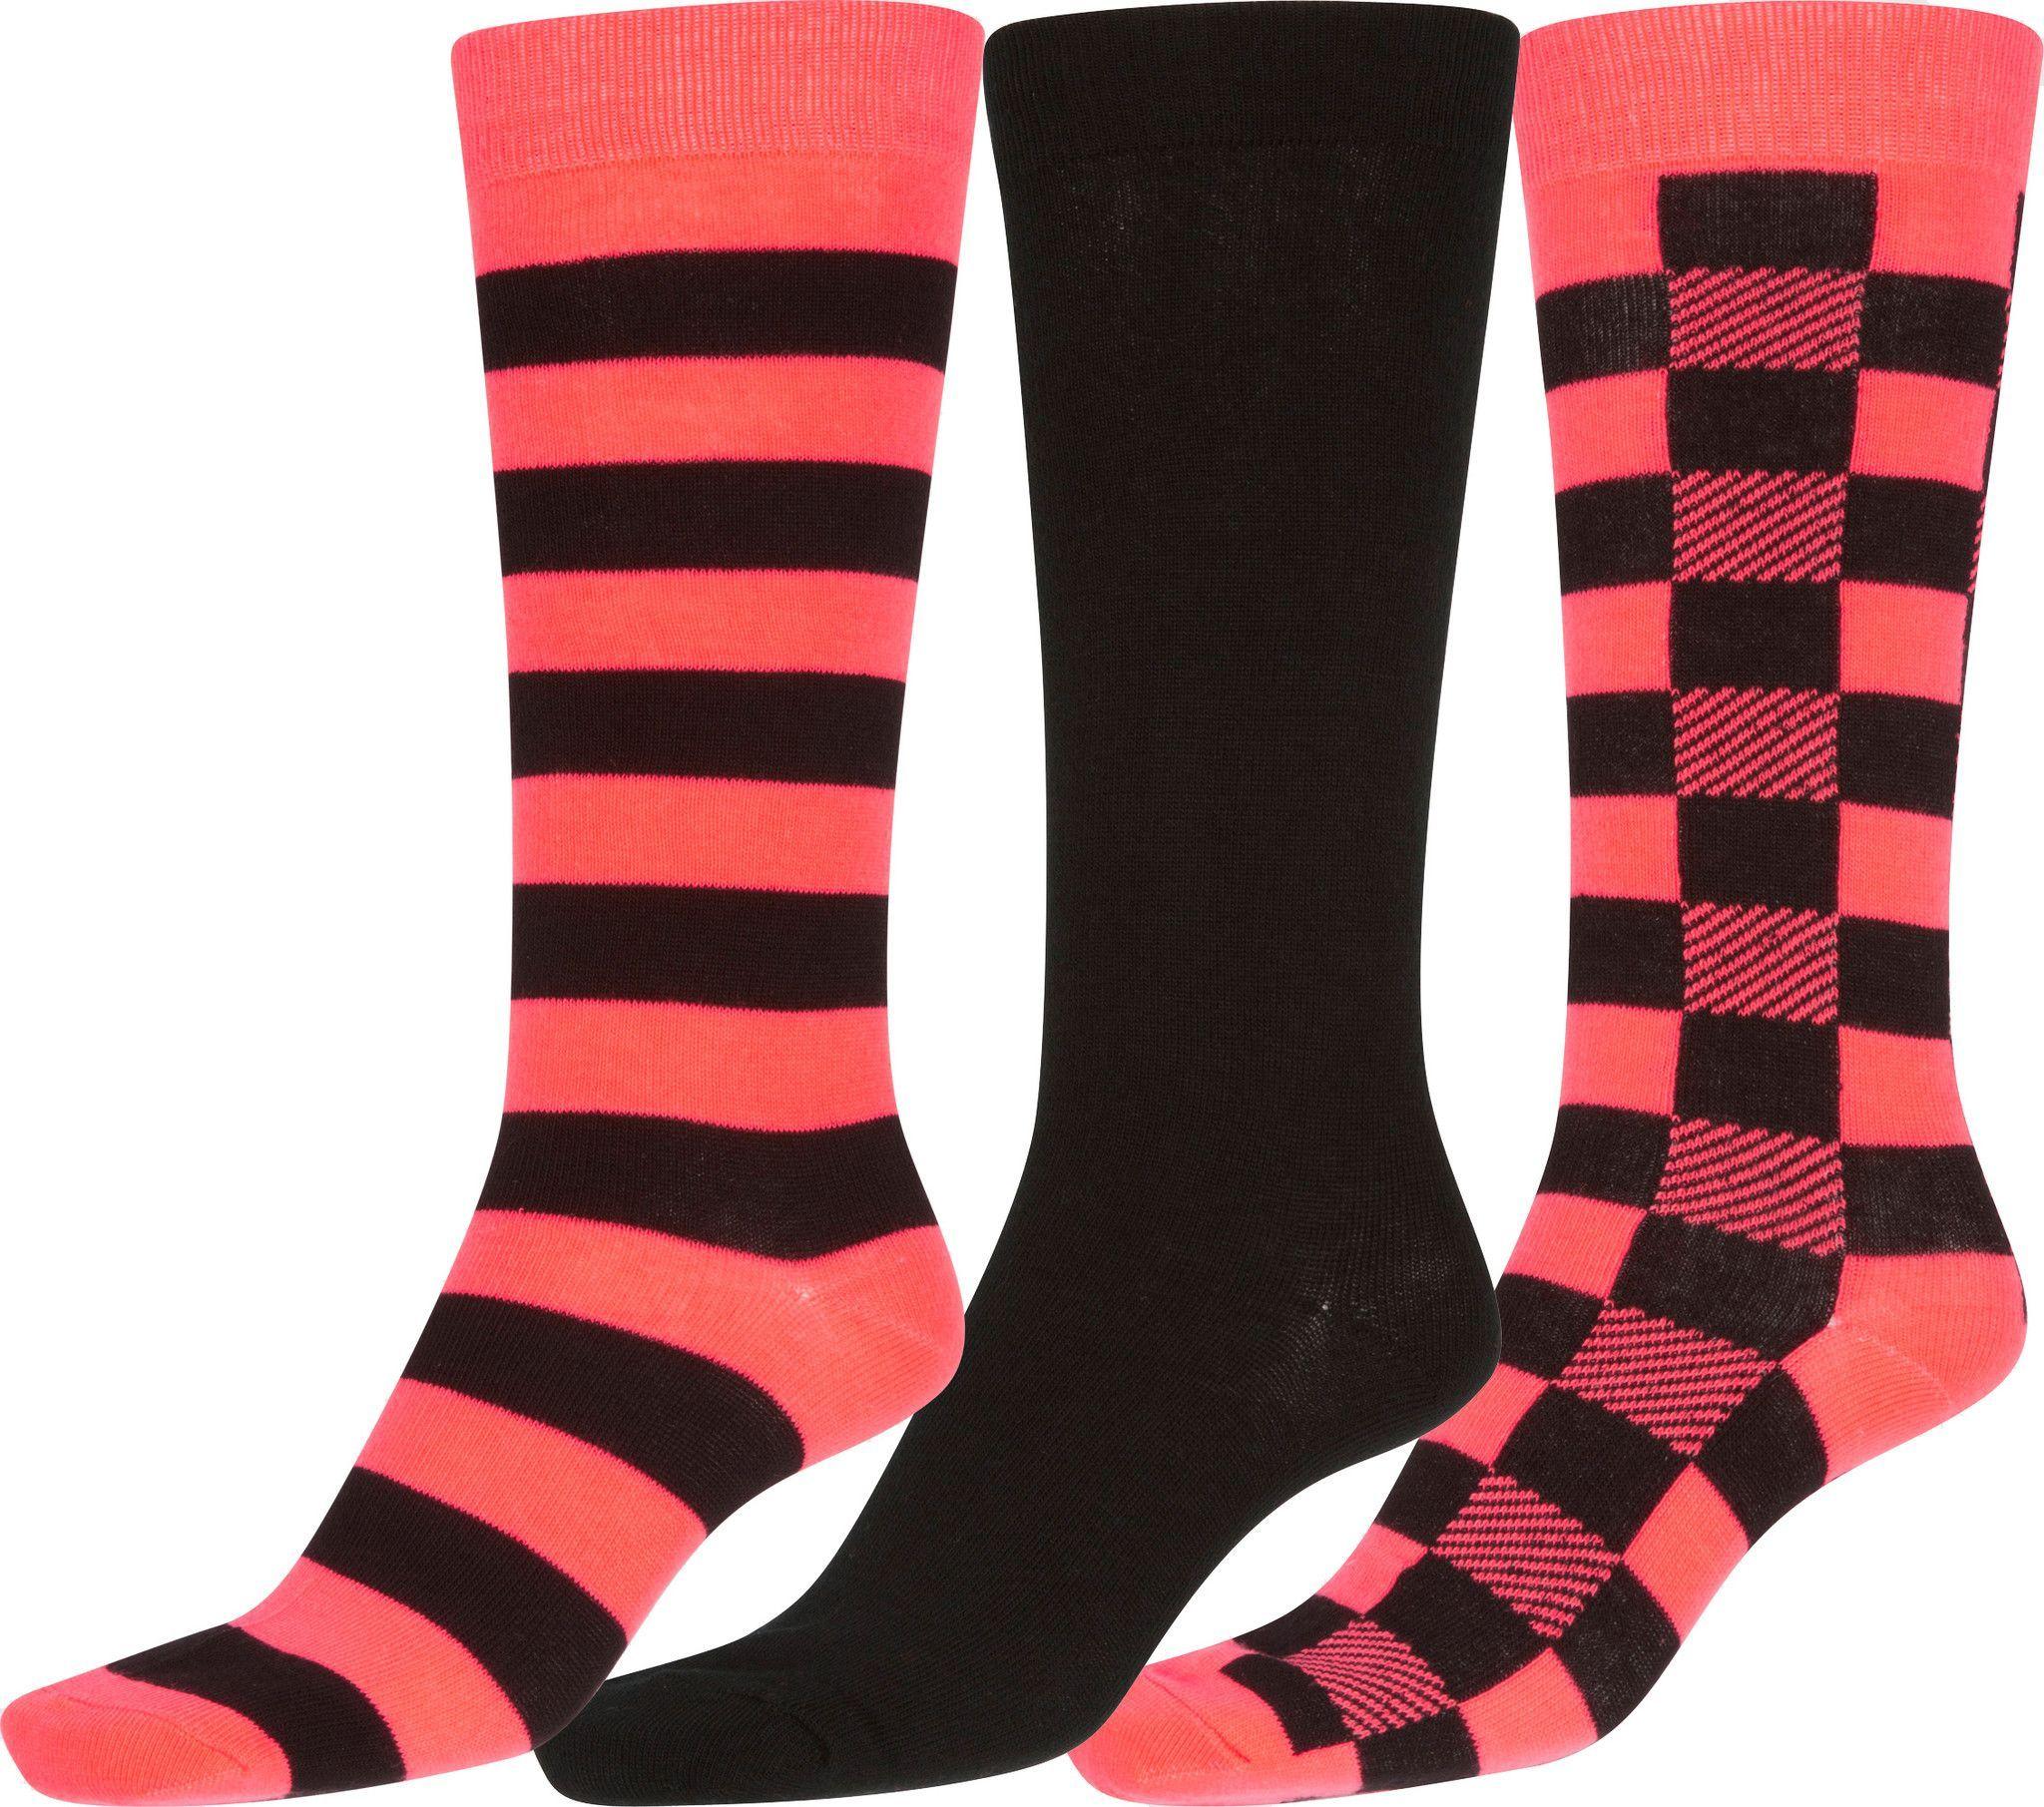 Sakkas Bina Womens Cute Colorful Design Knee High Socks Assorted 3-packs